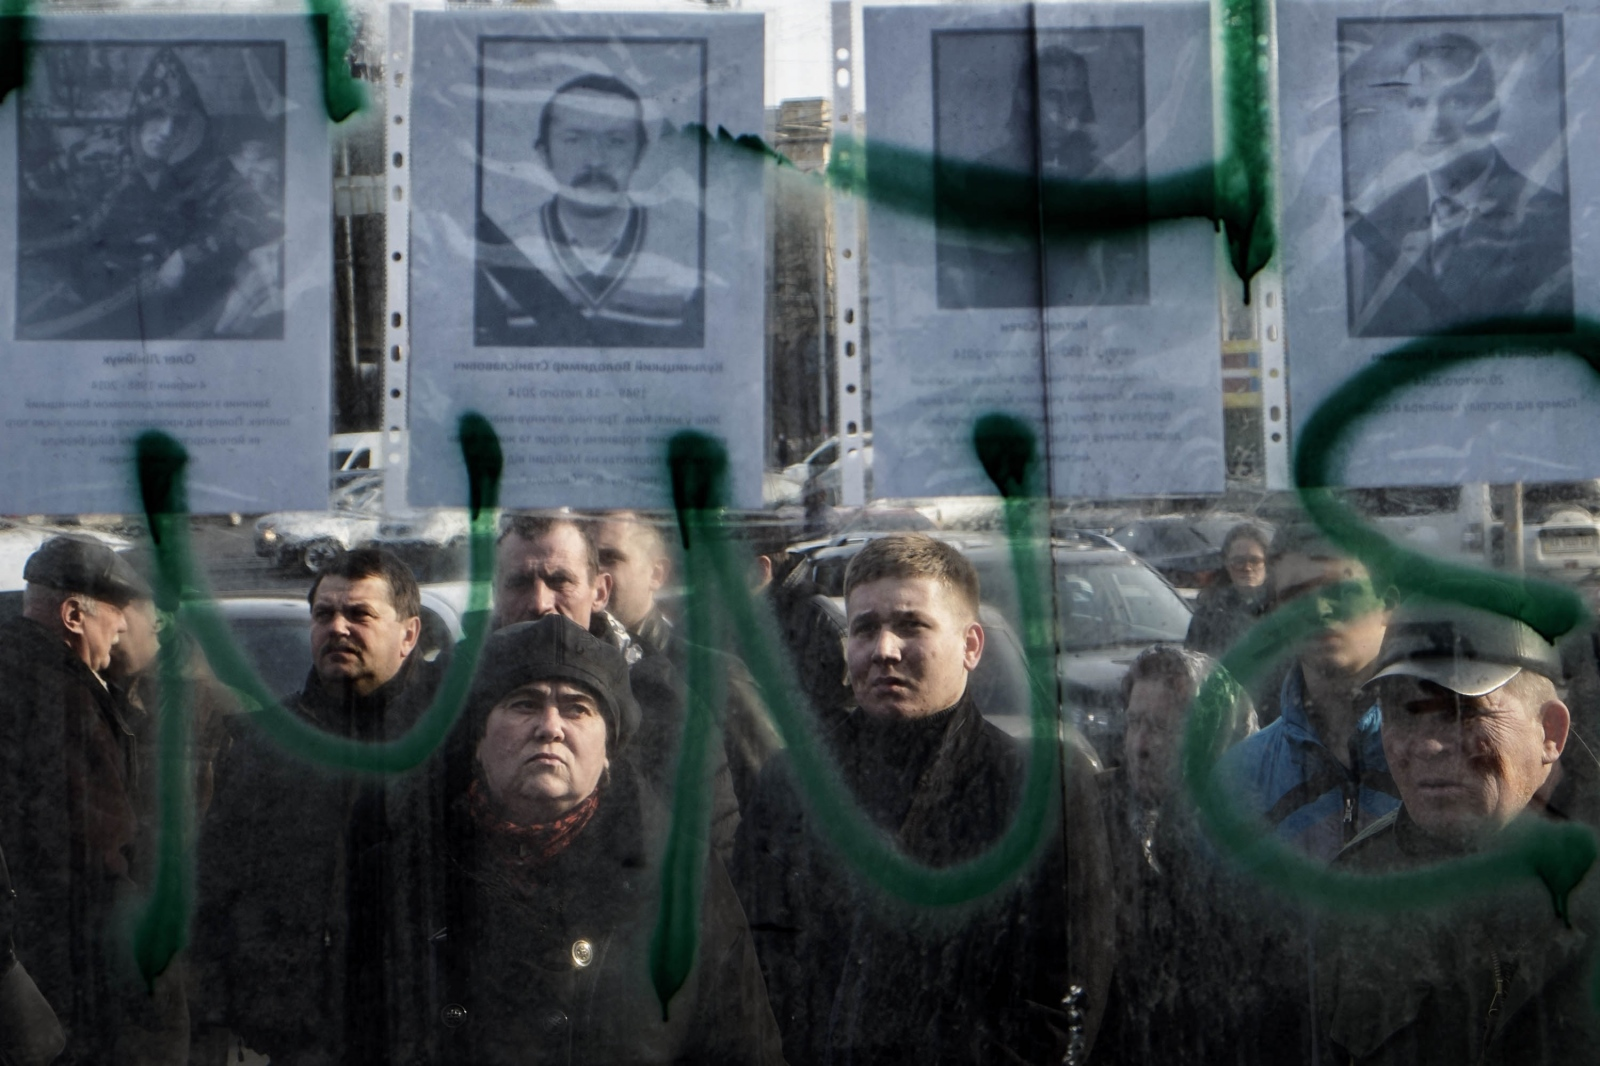 Art and Documentary Photography - Loading Behind_Kiev_s_barricades_075.jpg